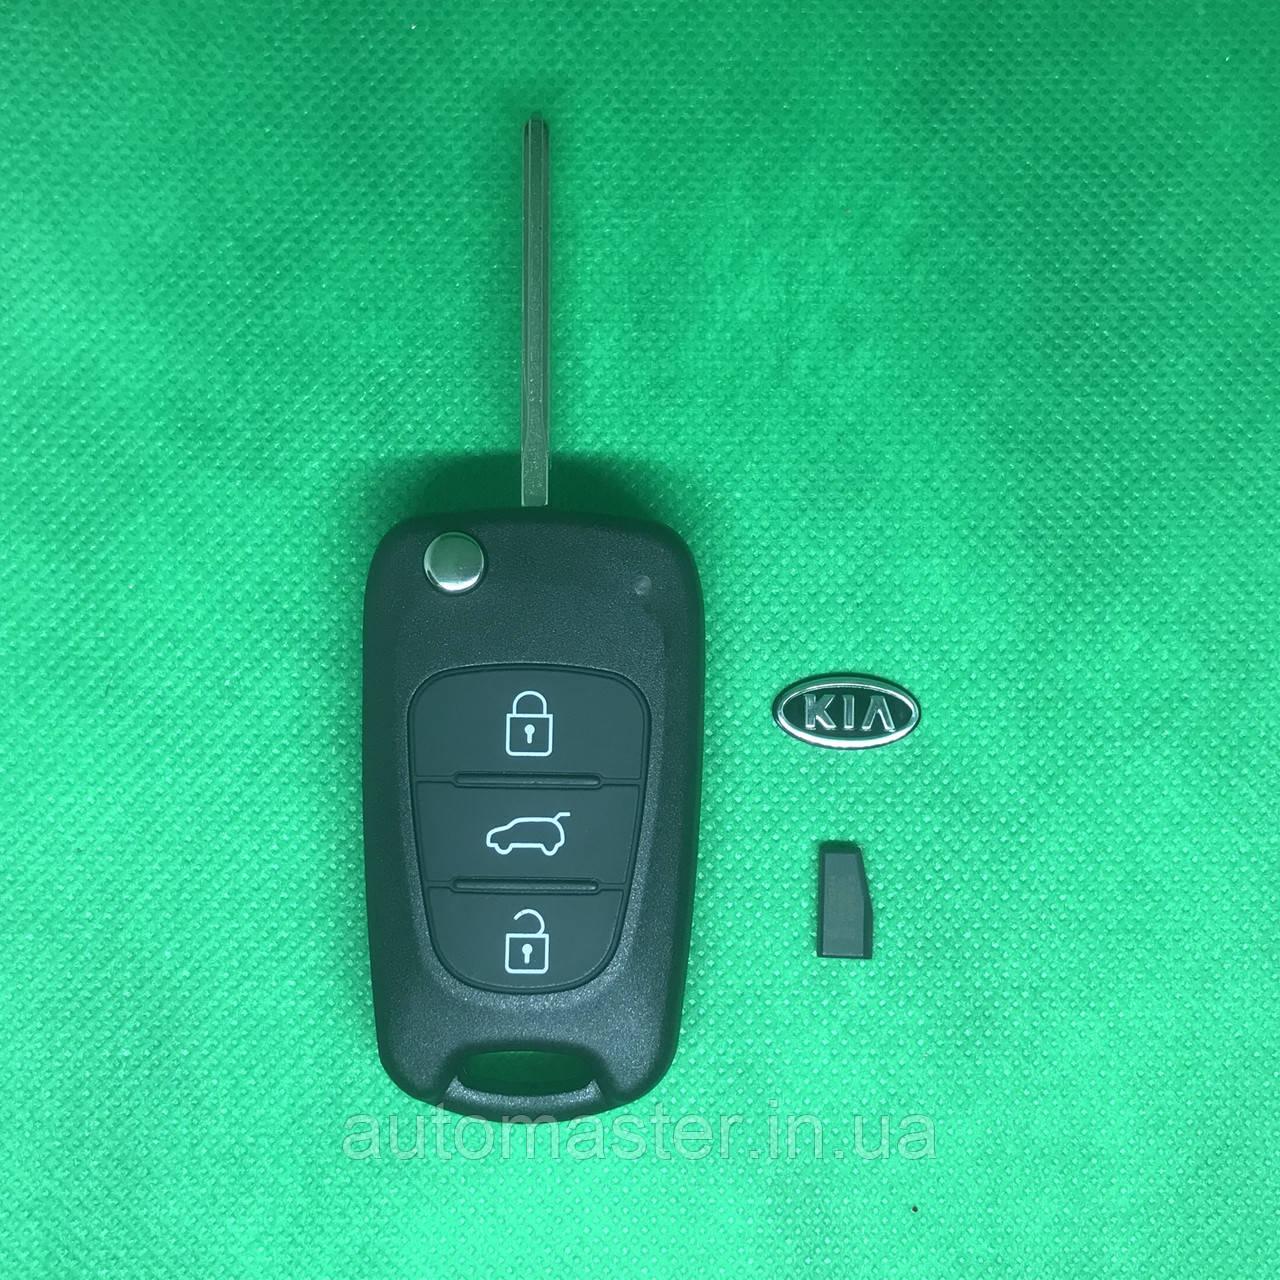 Выкидной ключ KIA Cerato,Ceed,Sportage,Sorento,Rio, Optima 3 кнопки ID46 433 Mhz КИА